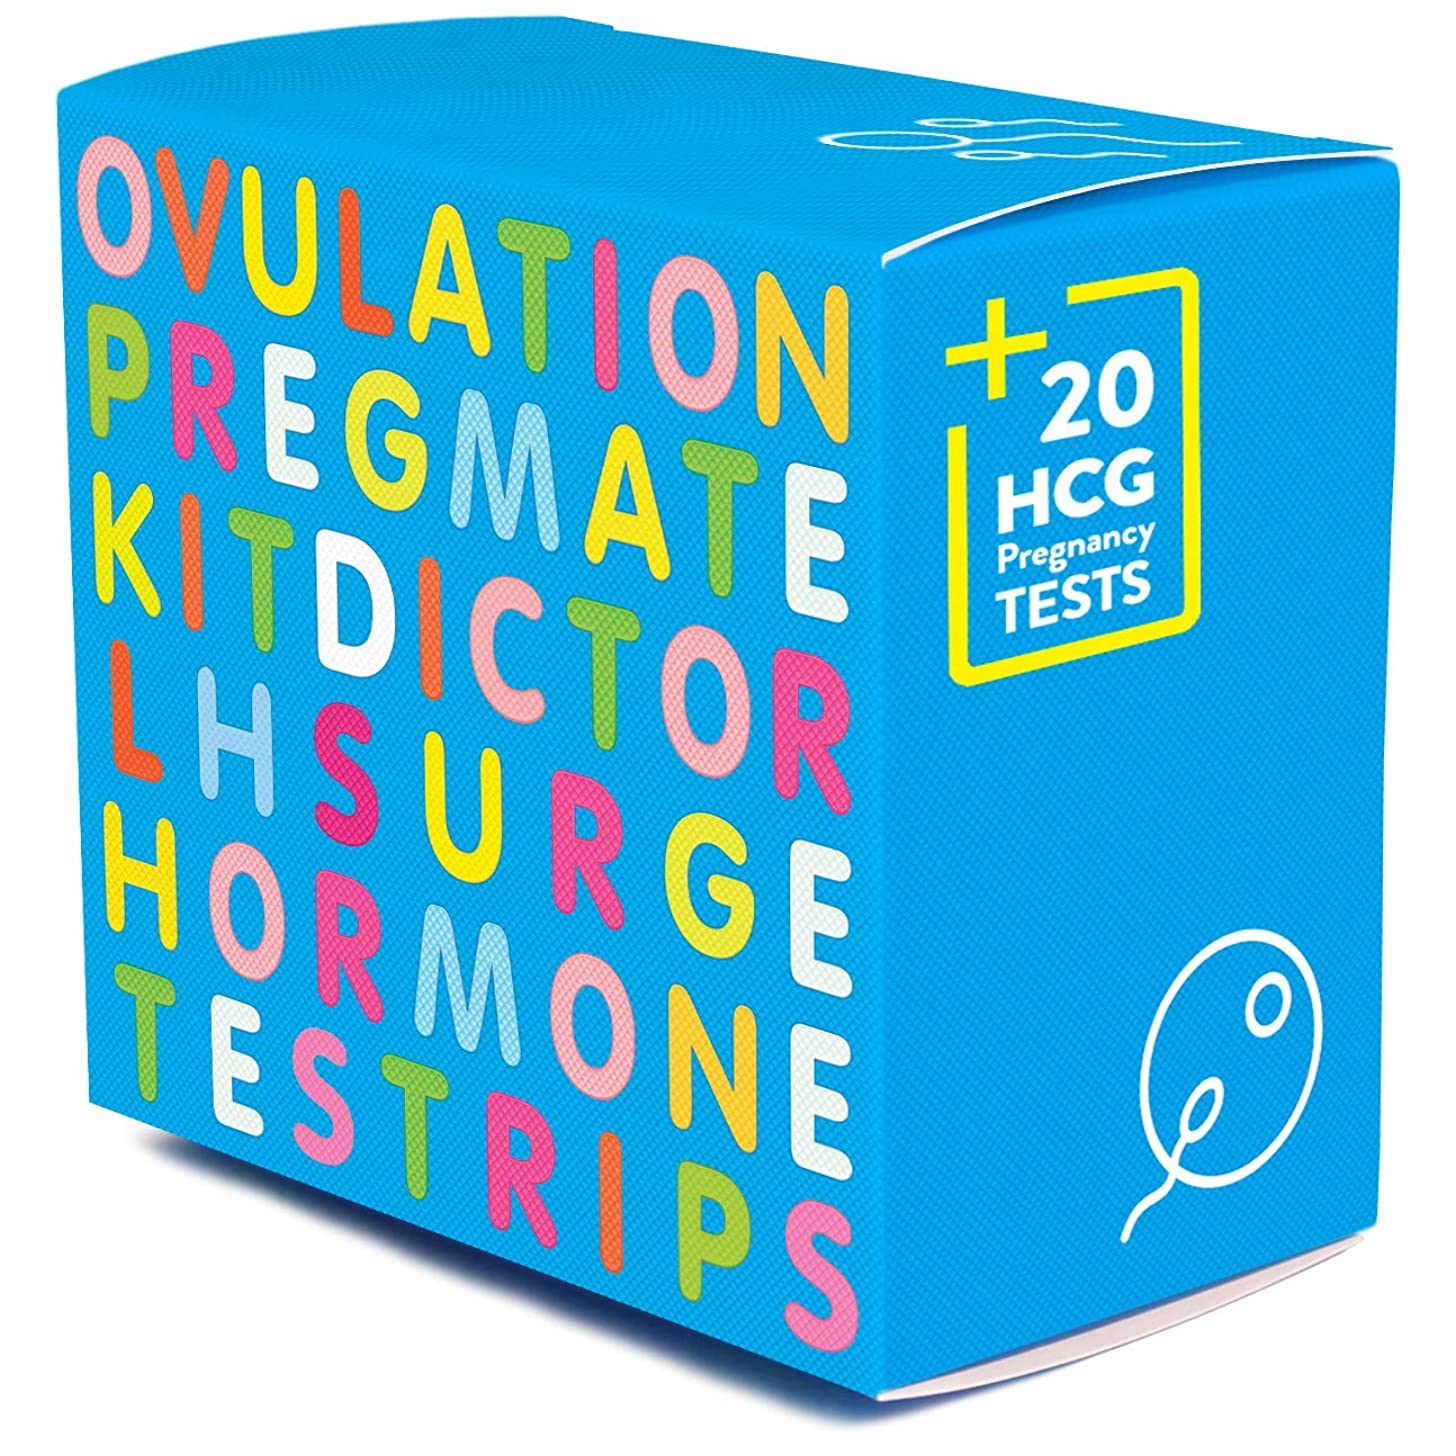 PREGMATE 100 Ovulation LH and 20 Pregnancy HCG Test Strips OPK LH Surge Predictor Kit Combo (100 LH + 20 HCG)